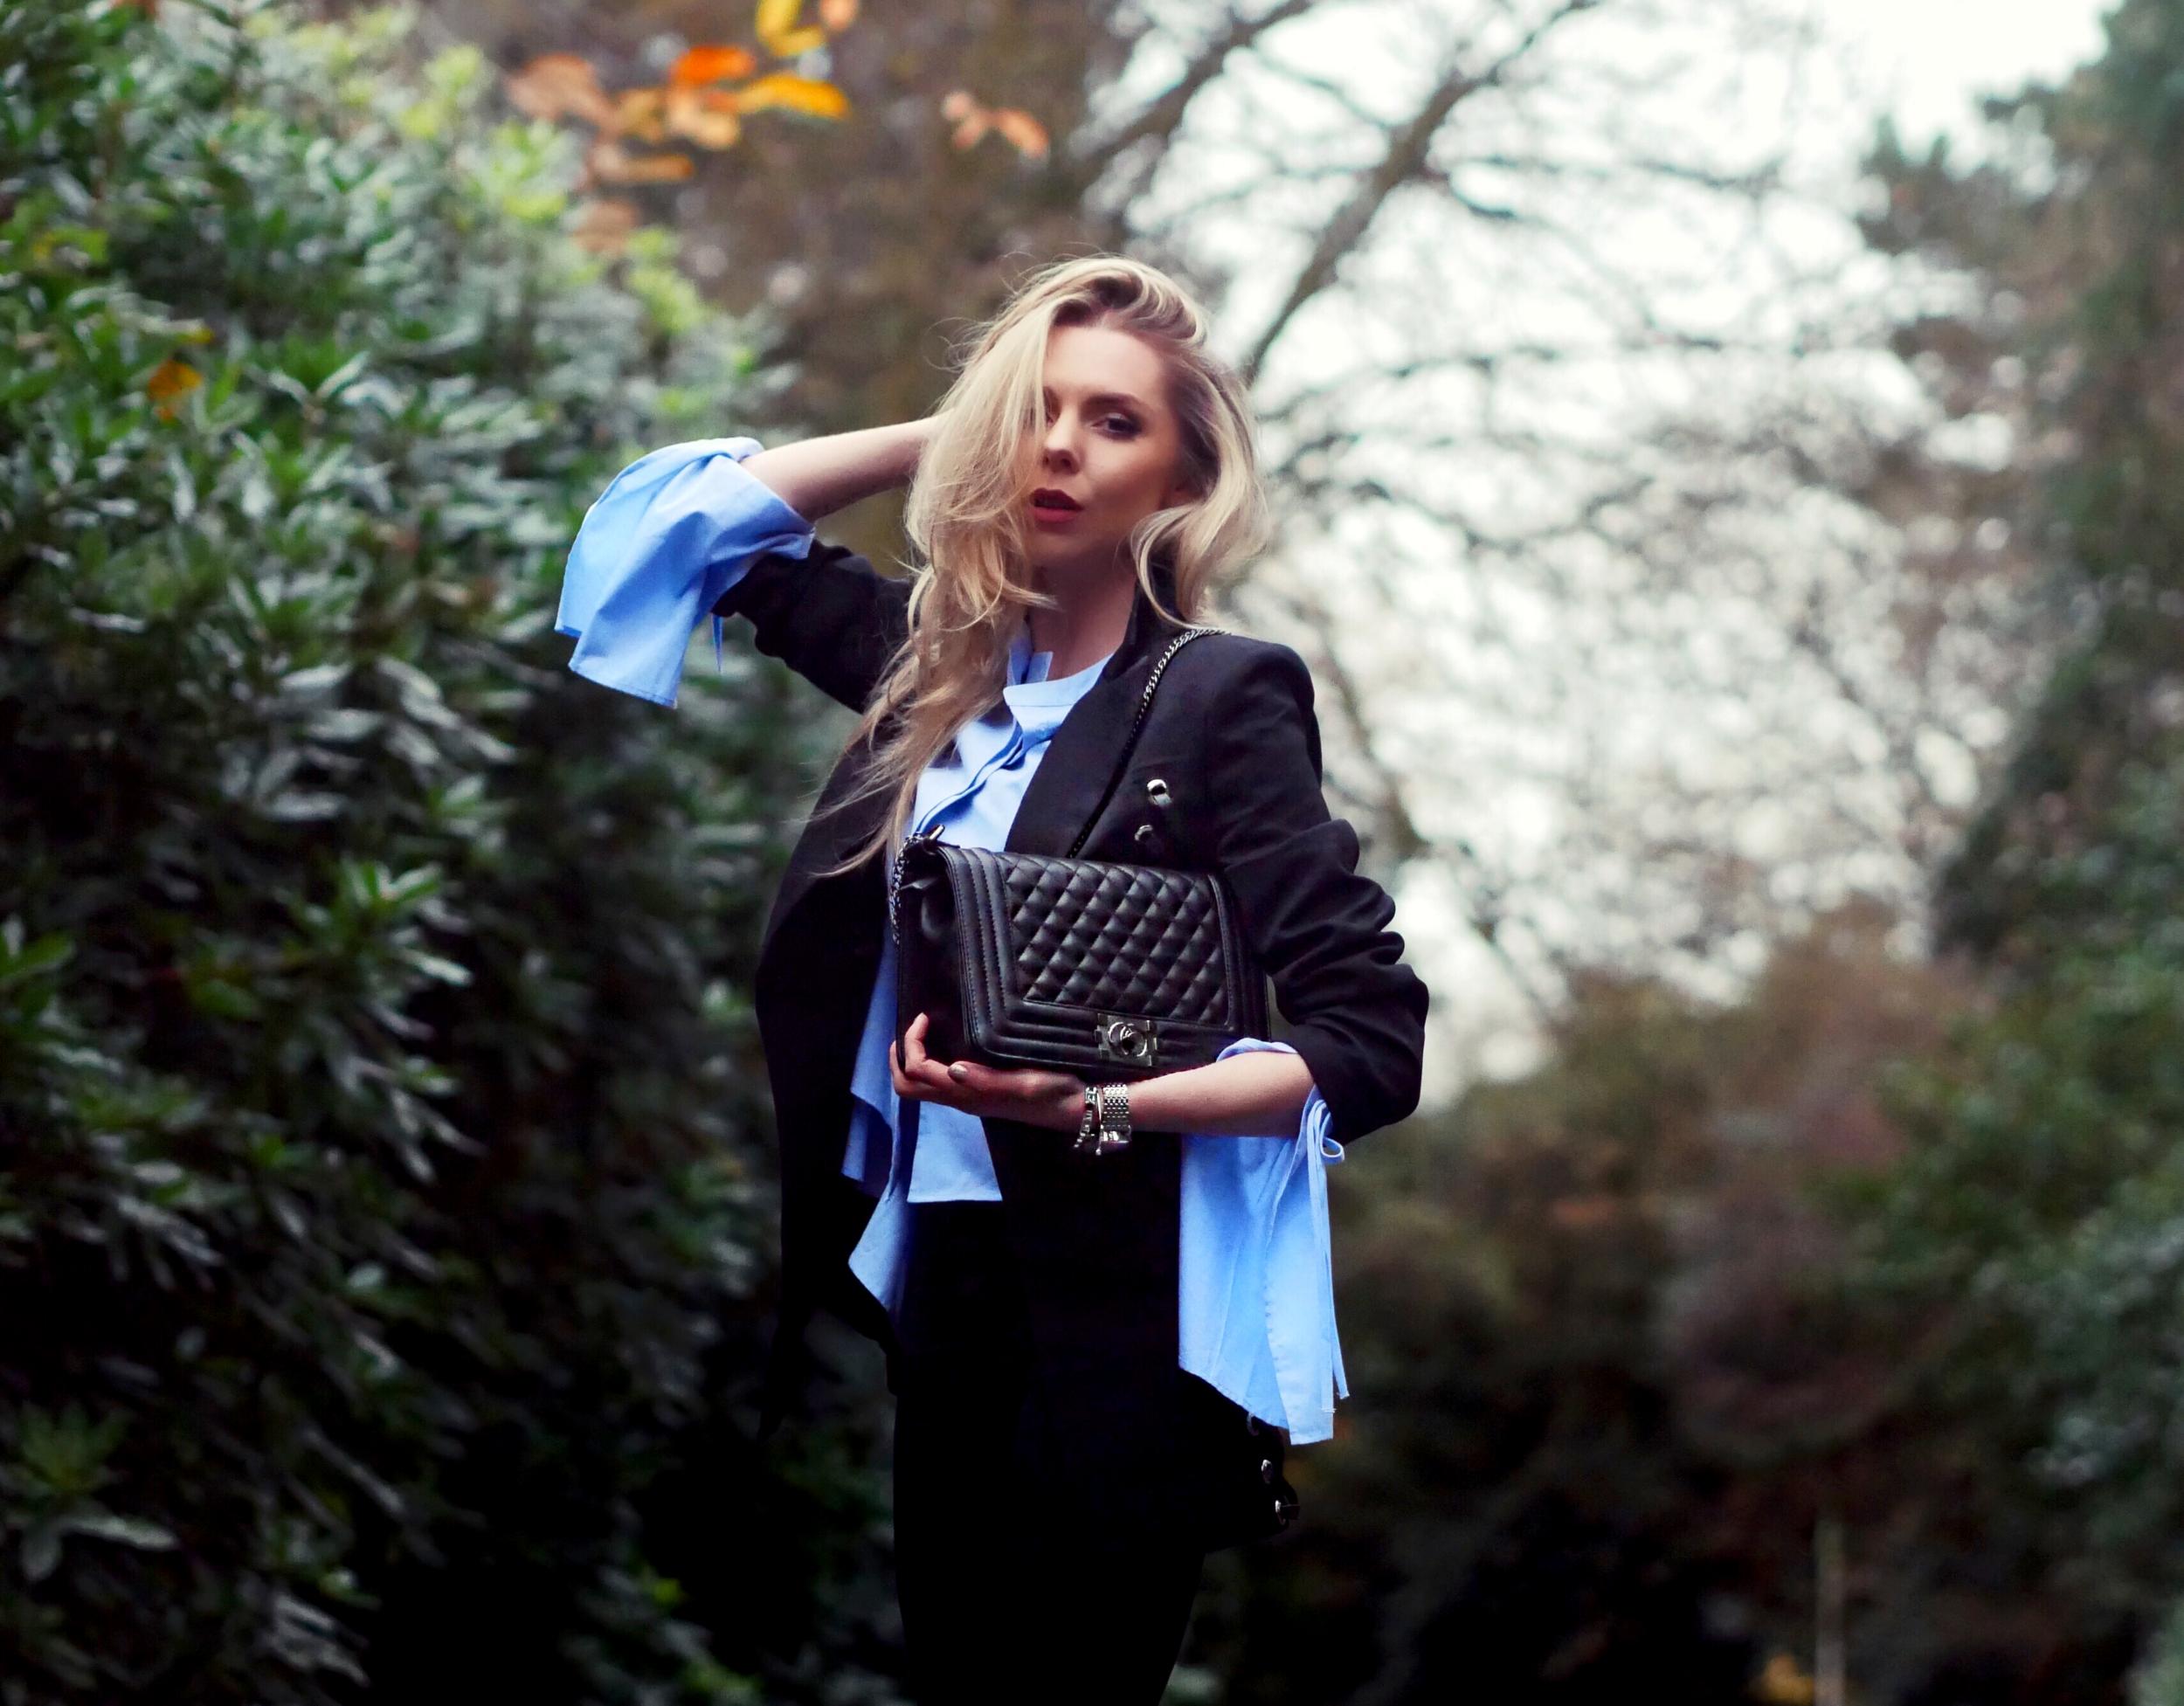 BLAZER, SMART DRESSING, WHAT TO WEAR TO WORK, OFFICE WEAR, LAURA BLAIR, LONDON FASHION GIRL, LAURA BLAIR